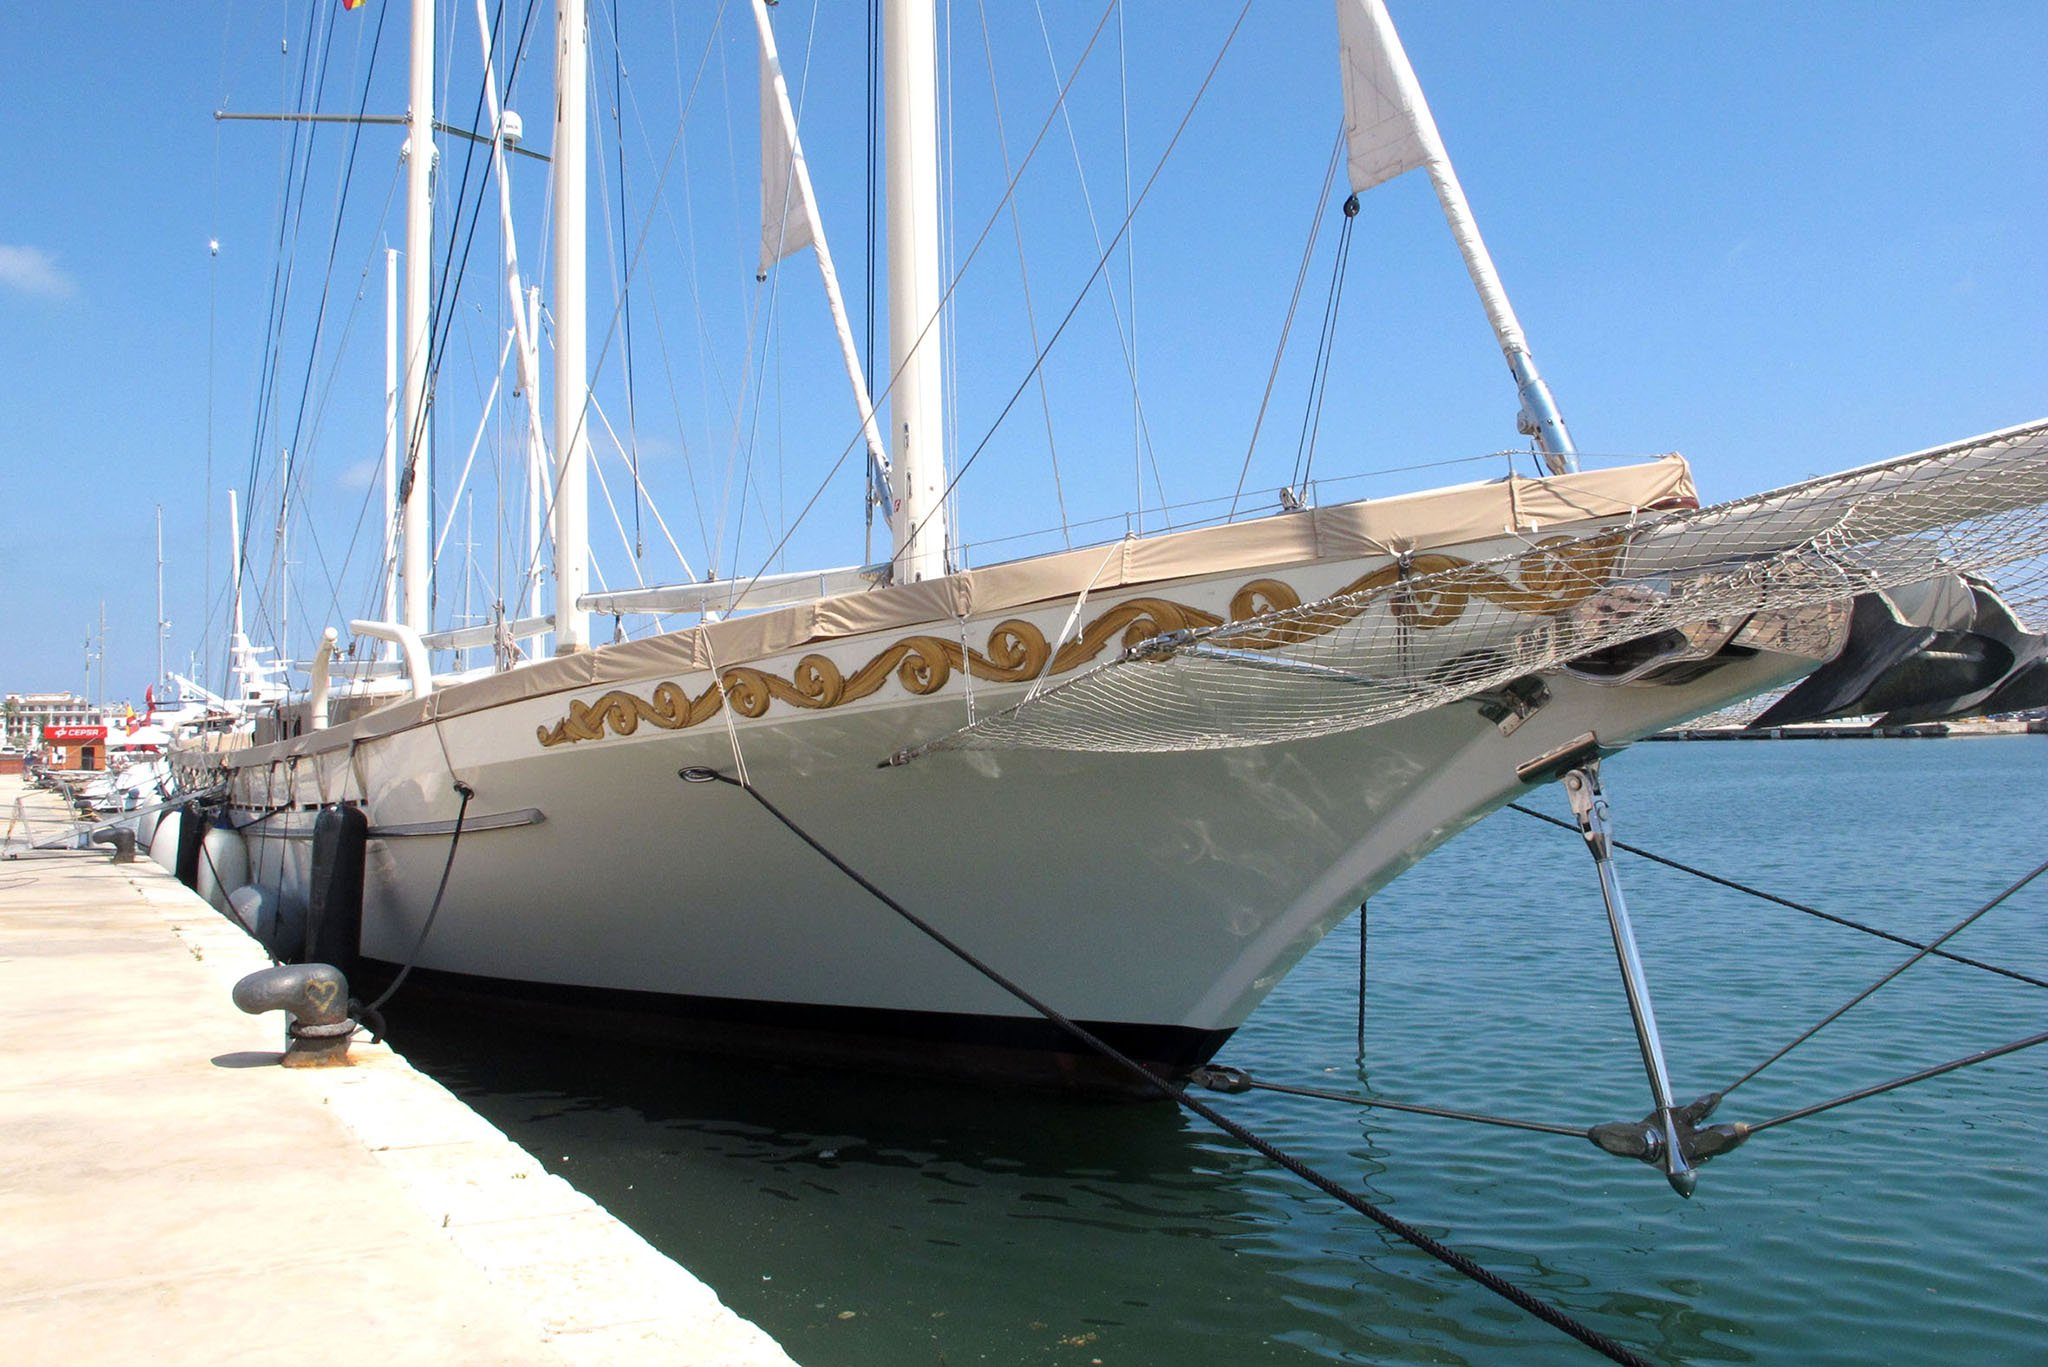 El velero de lujo Mikhail S. Vorontsov en Dénia 03